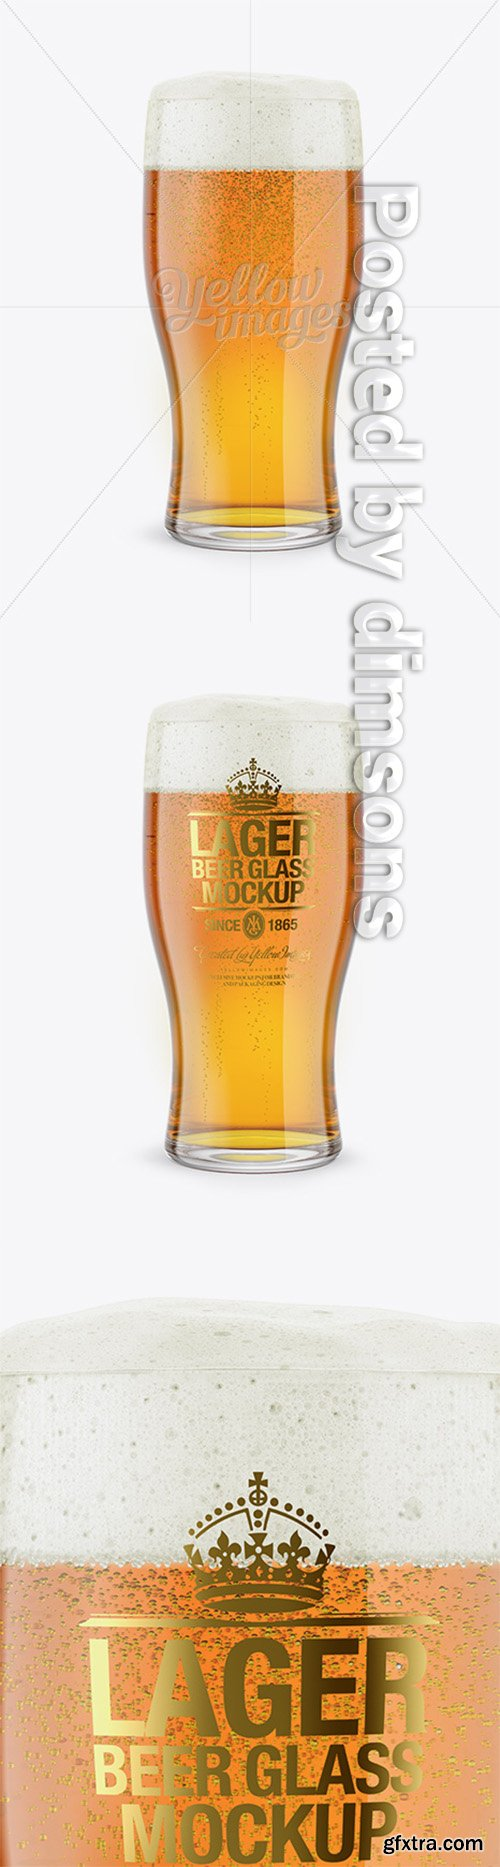 Lager Beer Glass Mockup 15550